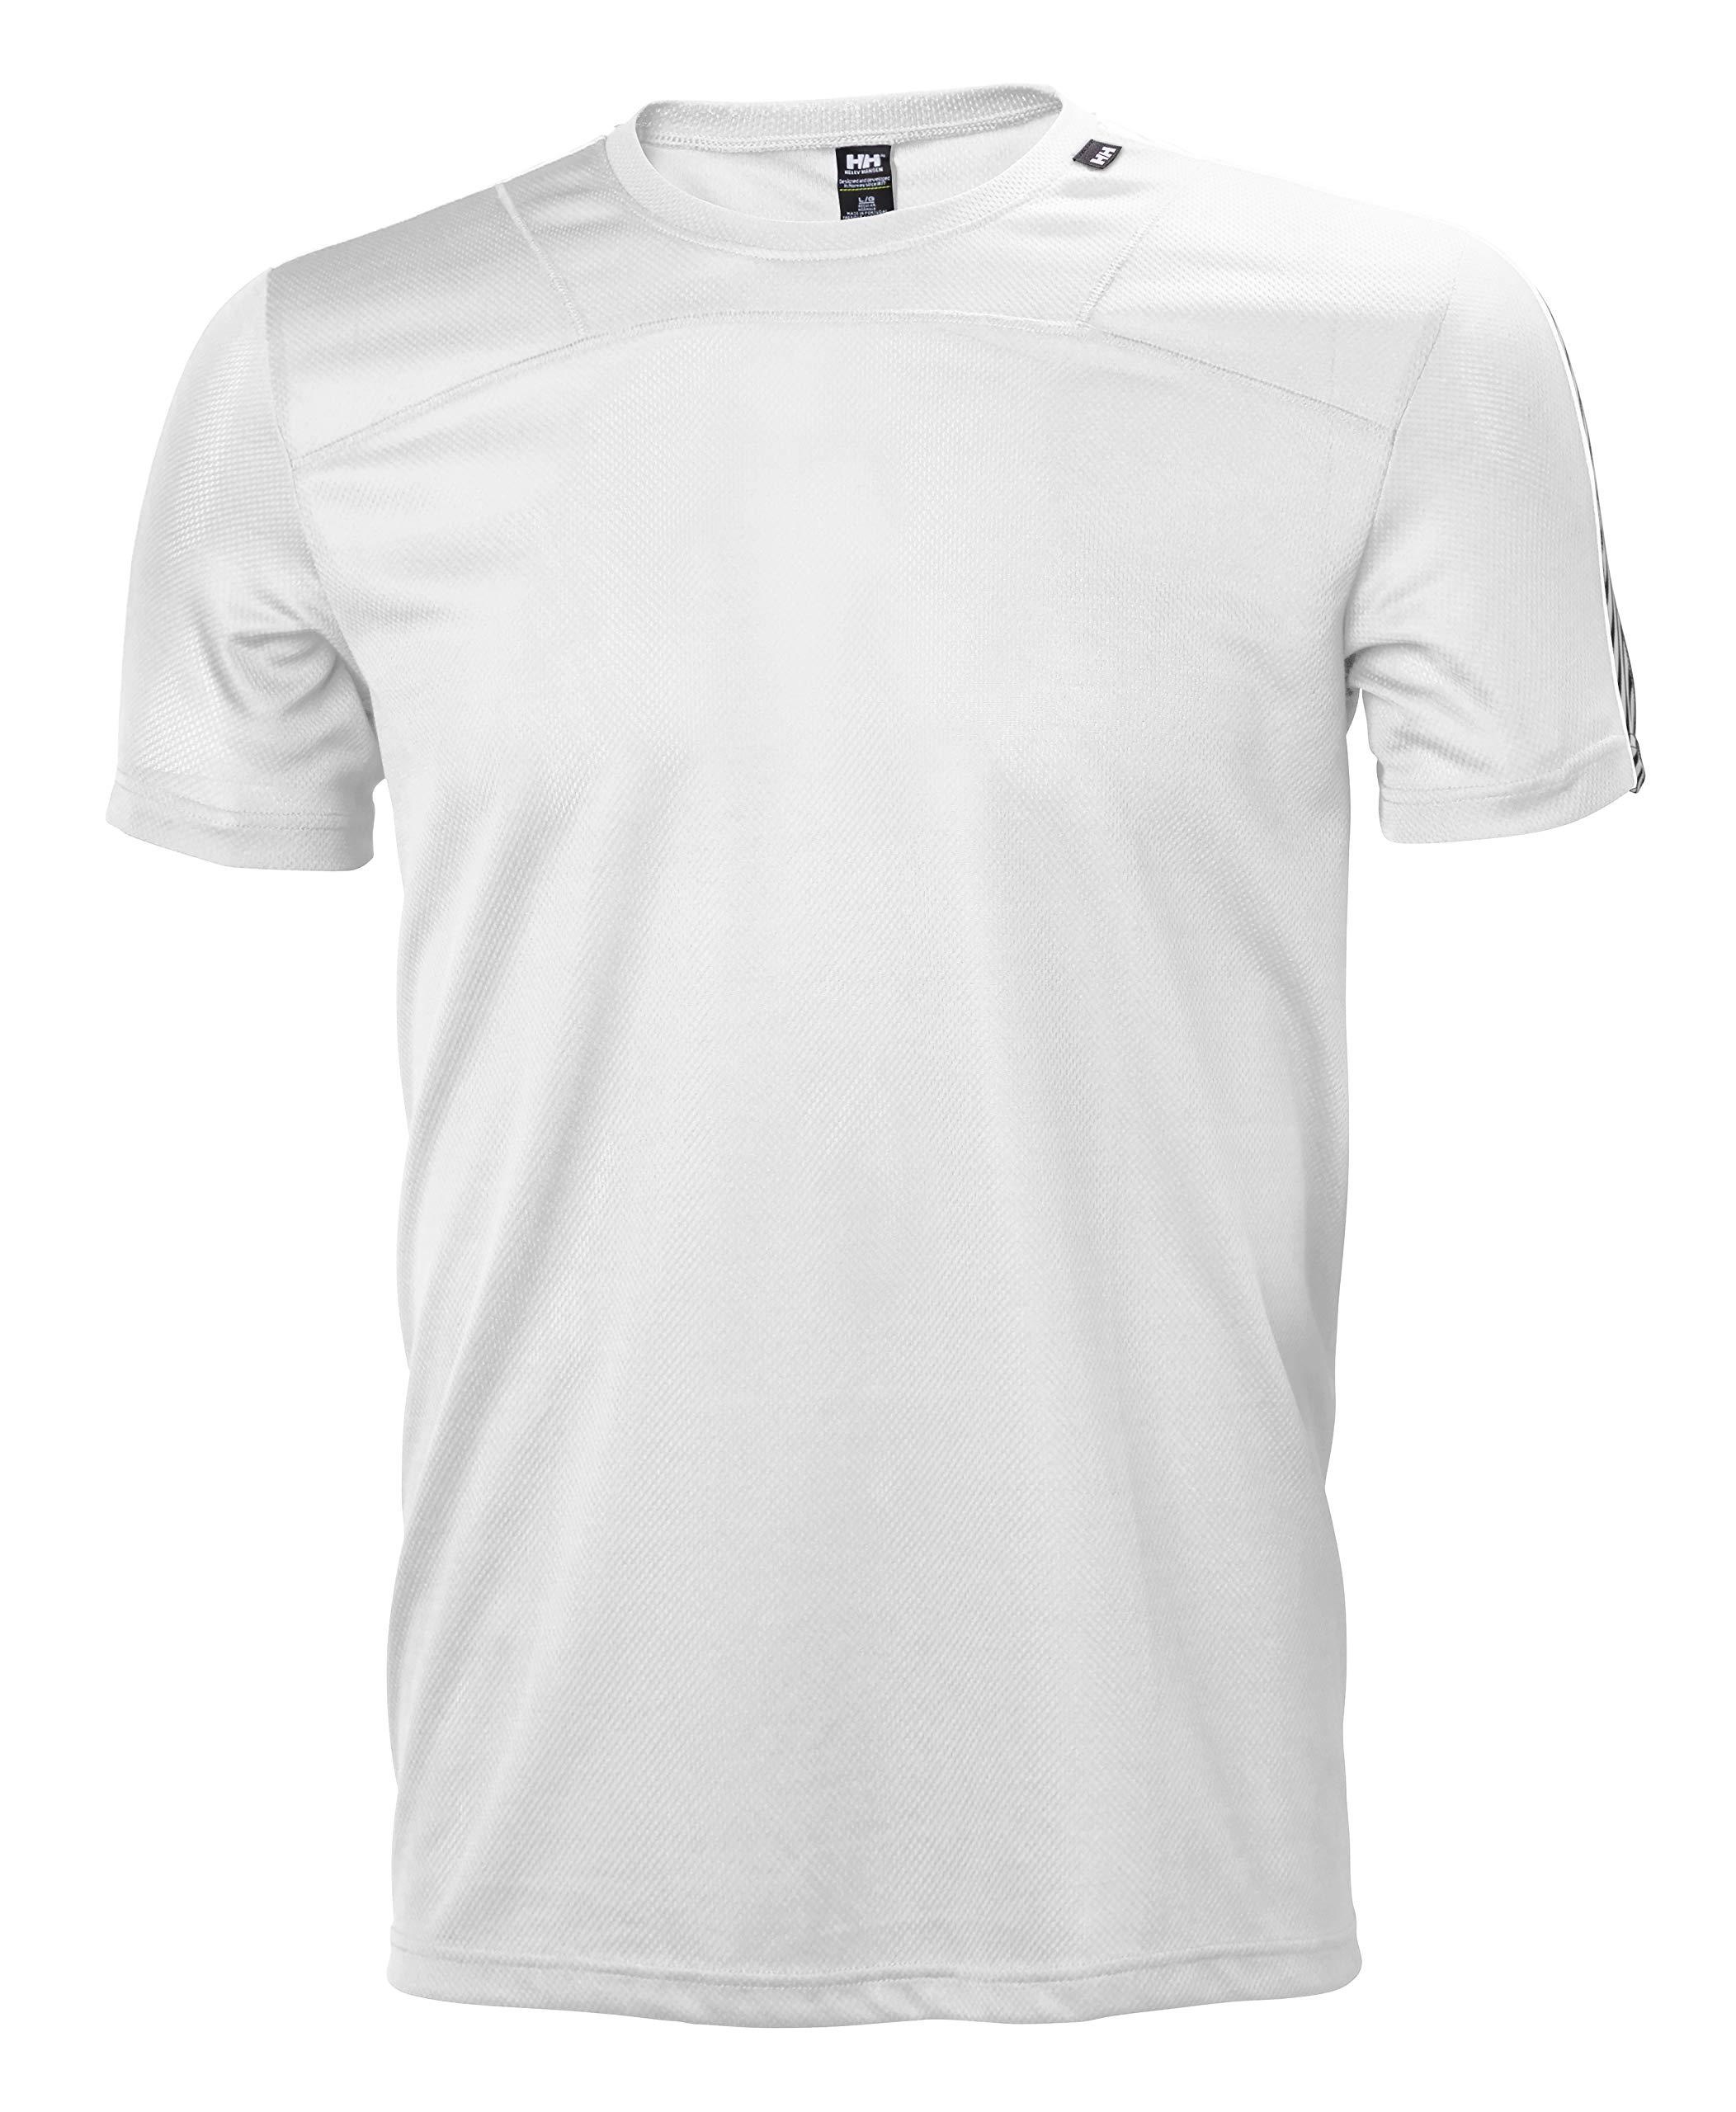 Helly Hansen 48304 Men's LIFA T-Shirt